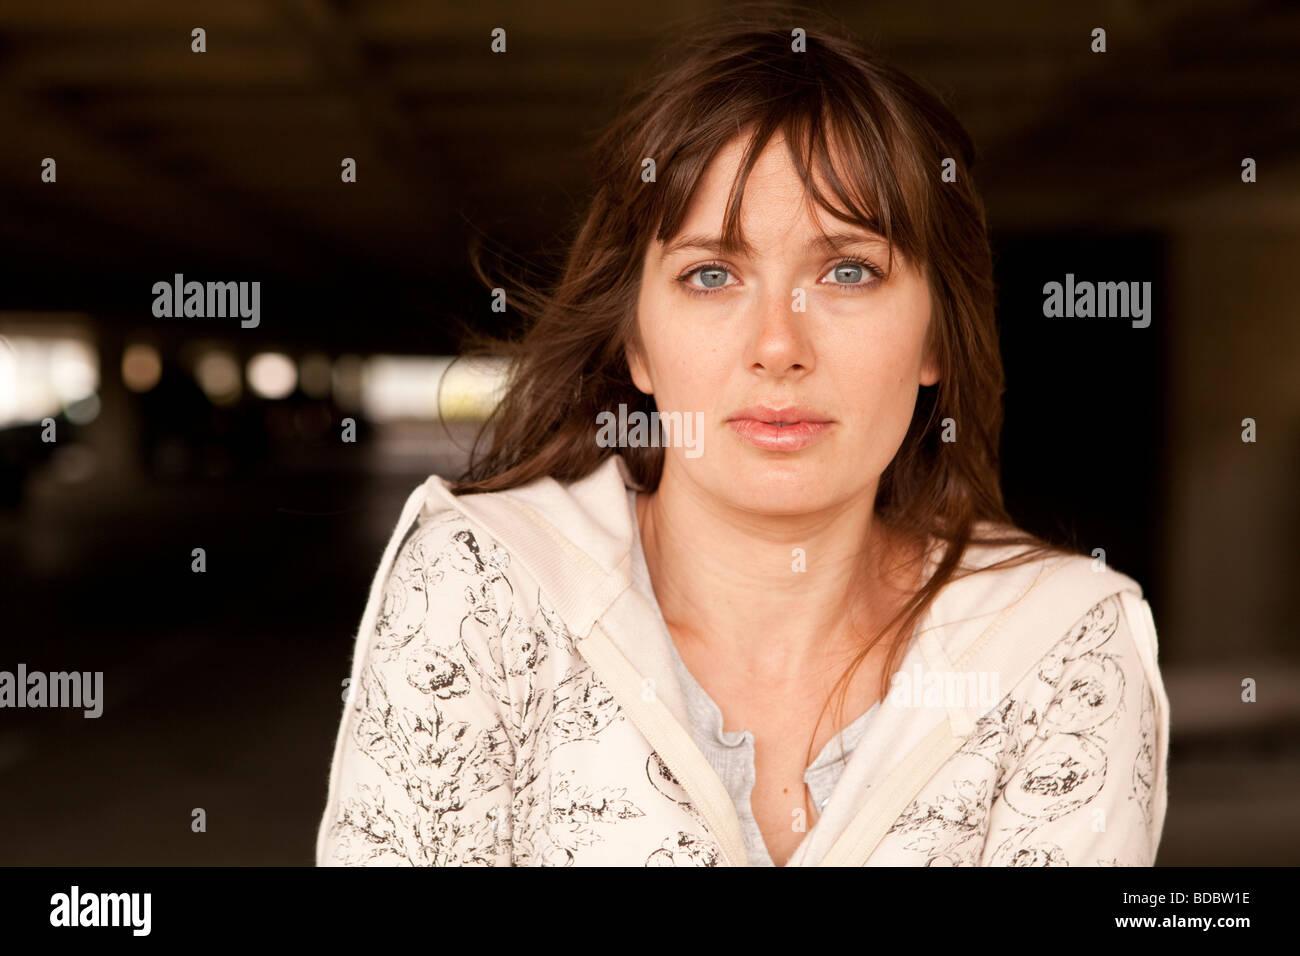 Portrait of Caucasian female brunette against waffle-like pattern of parking garage structure. - Stock Image